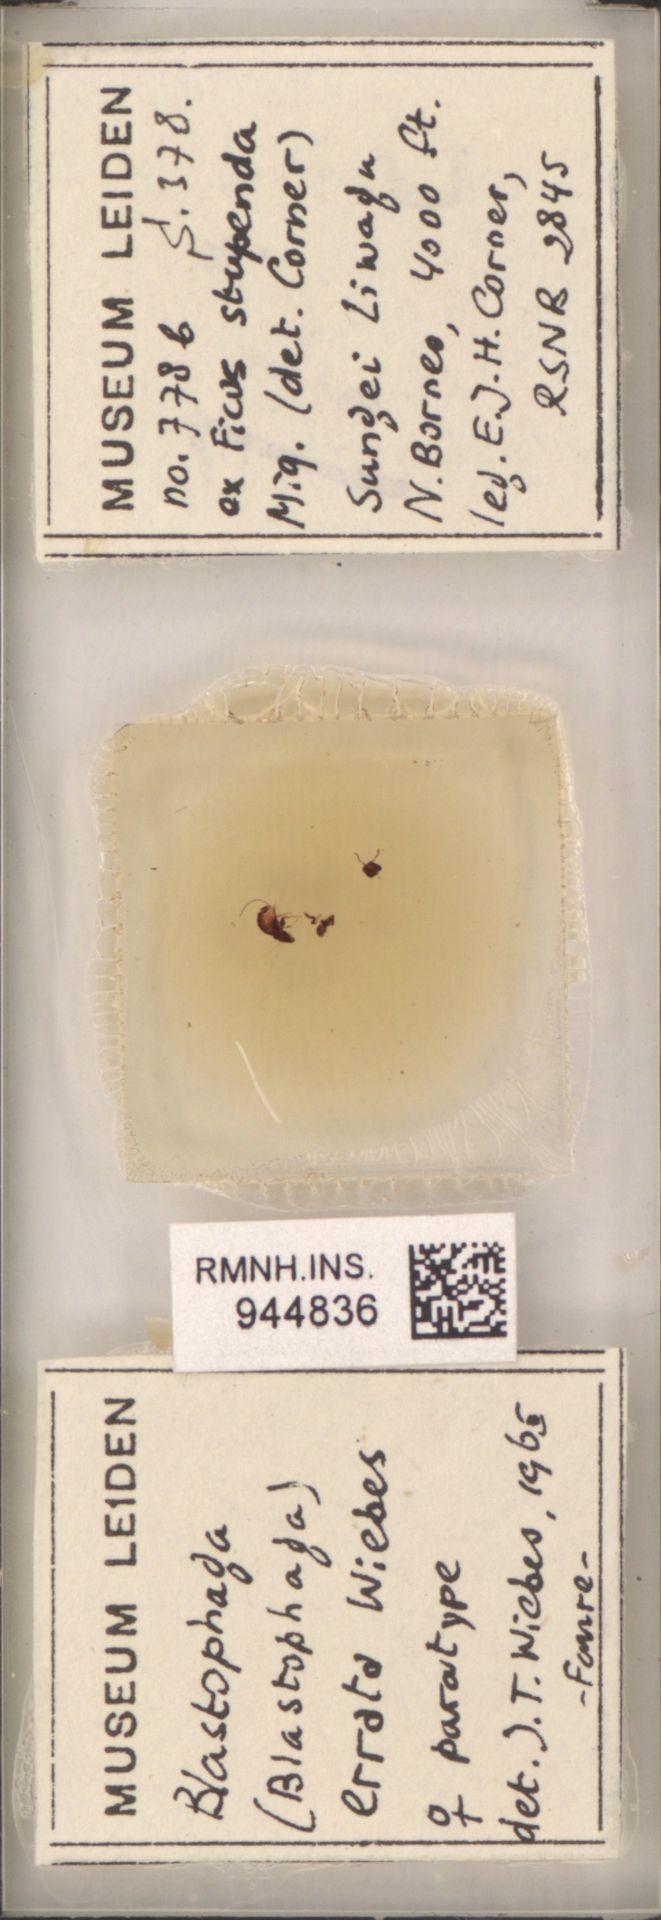 RMNH.INS.944836 | Blastophaga (Blastophaga) errata Wiebes